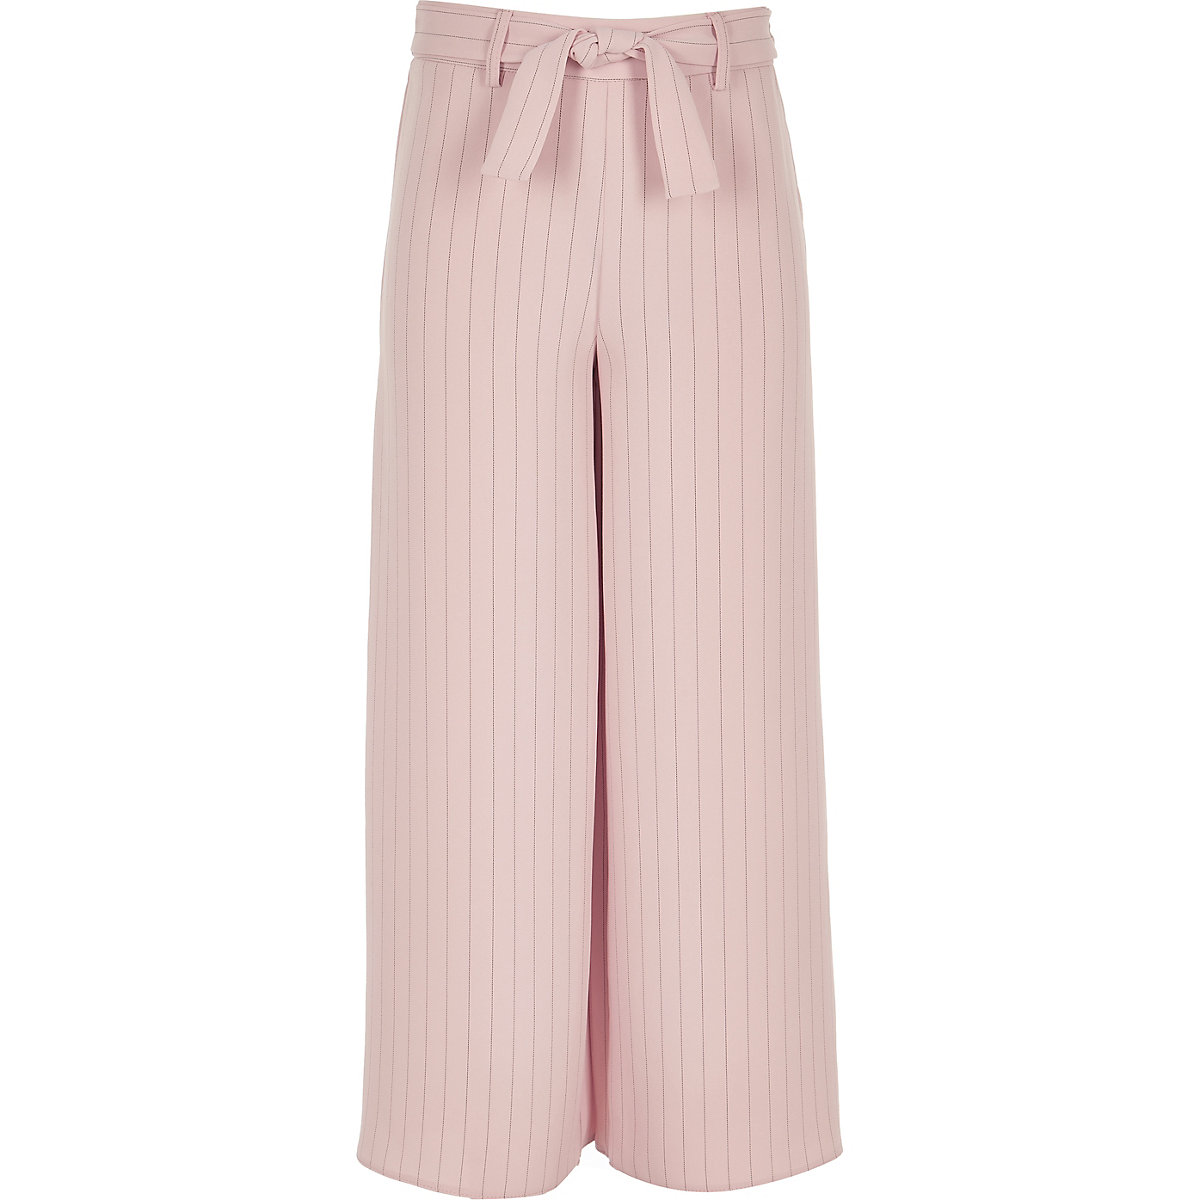 Girls pink stripe tie waist pants